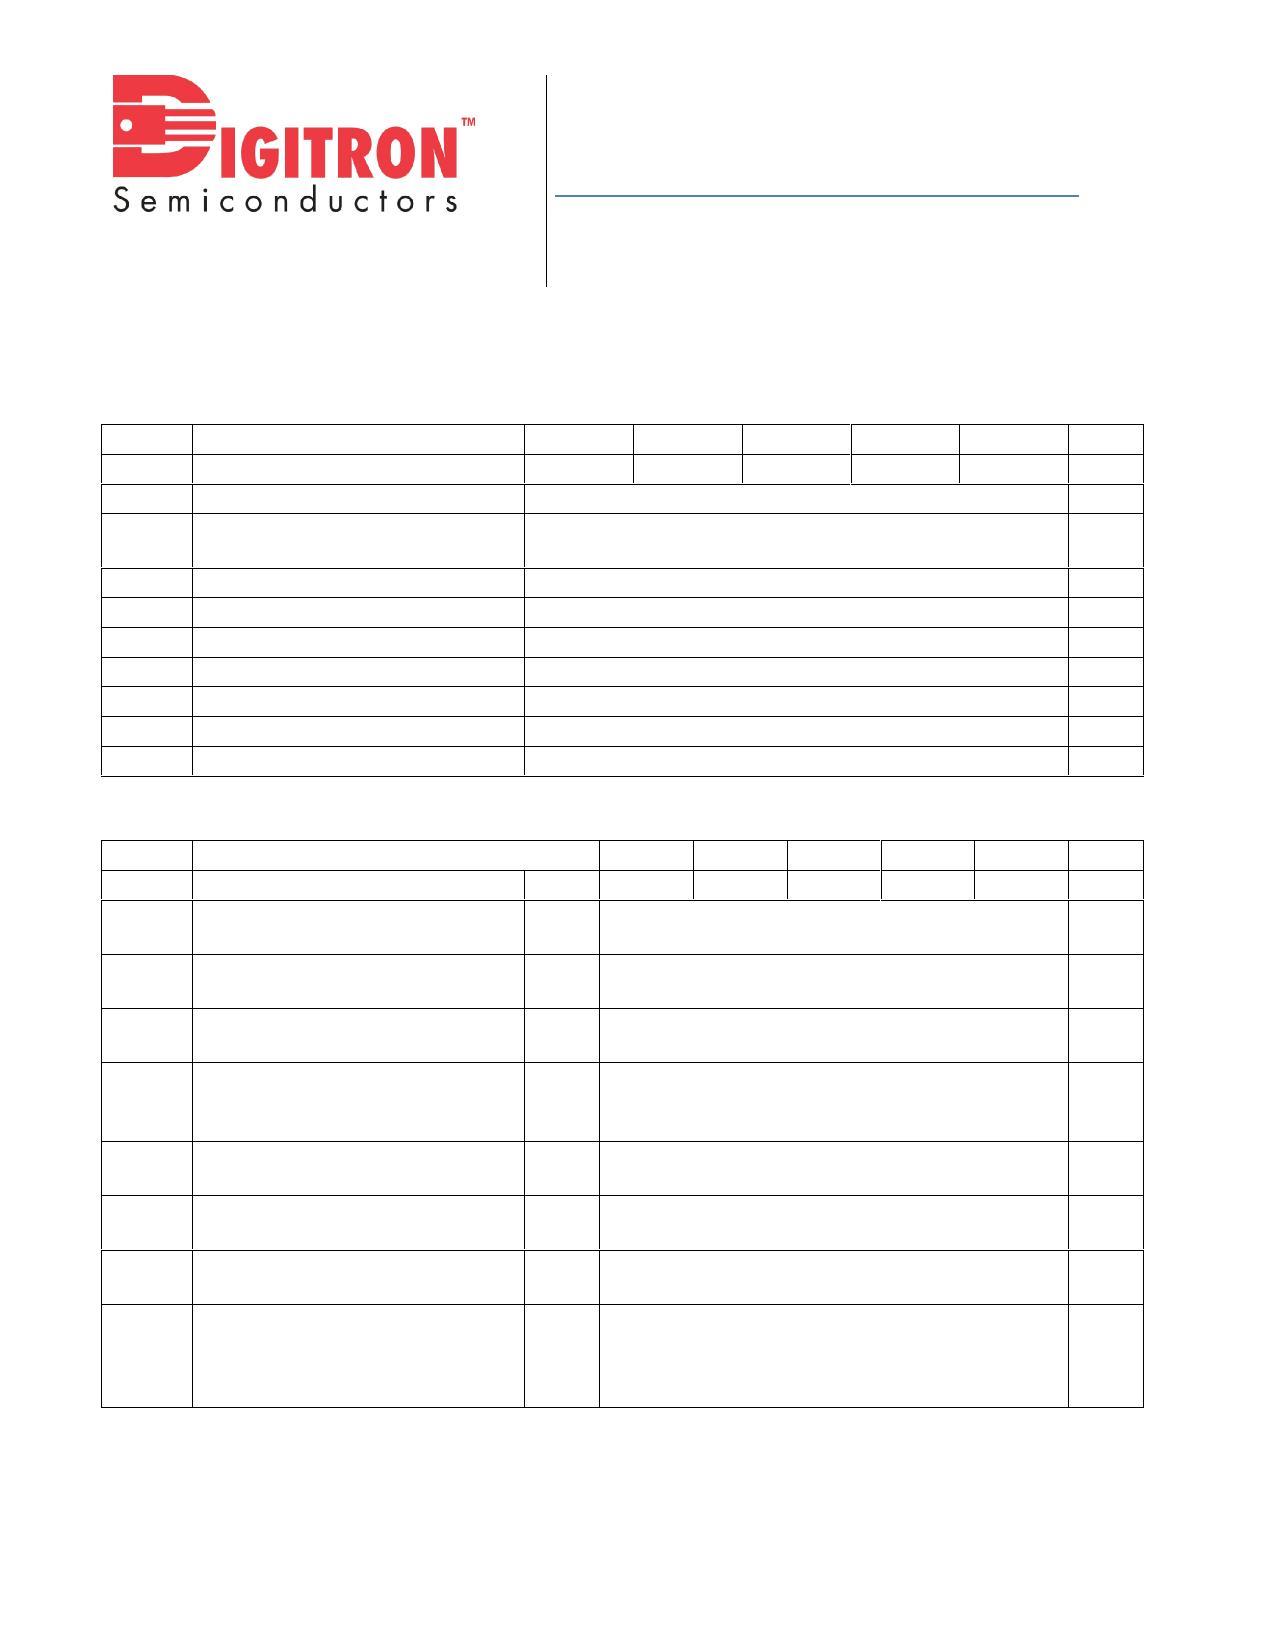 2N1598 datasheet